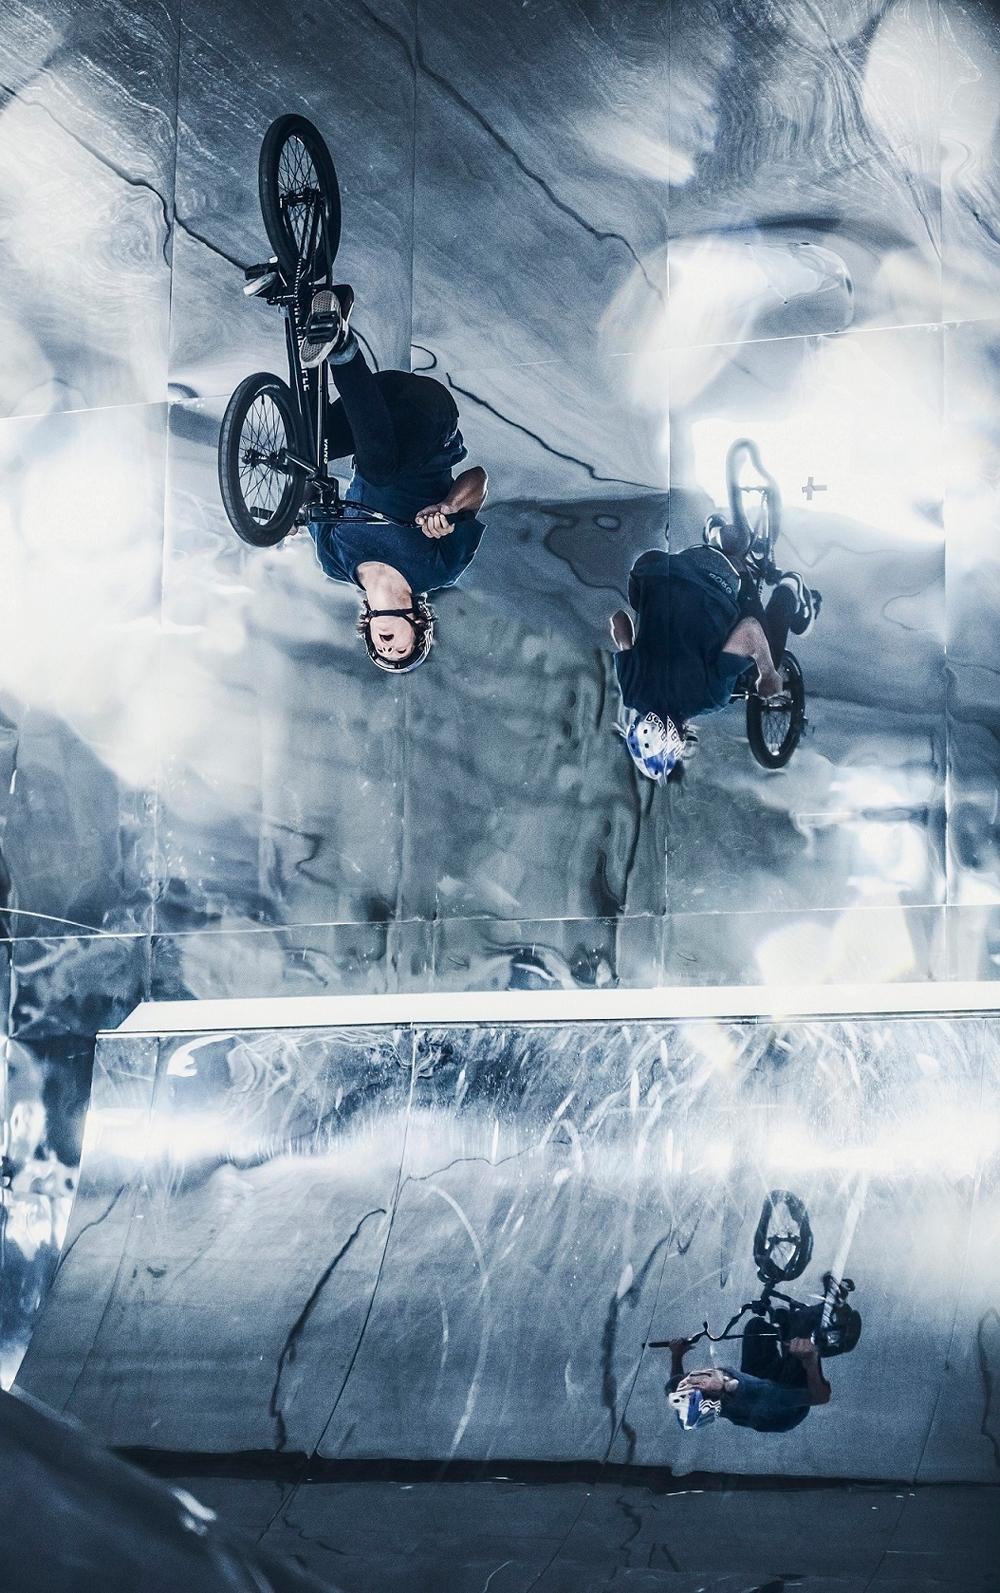 Red Bull Mirror Park BMX video Courage Adams Paul Tholen